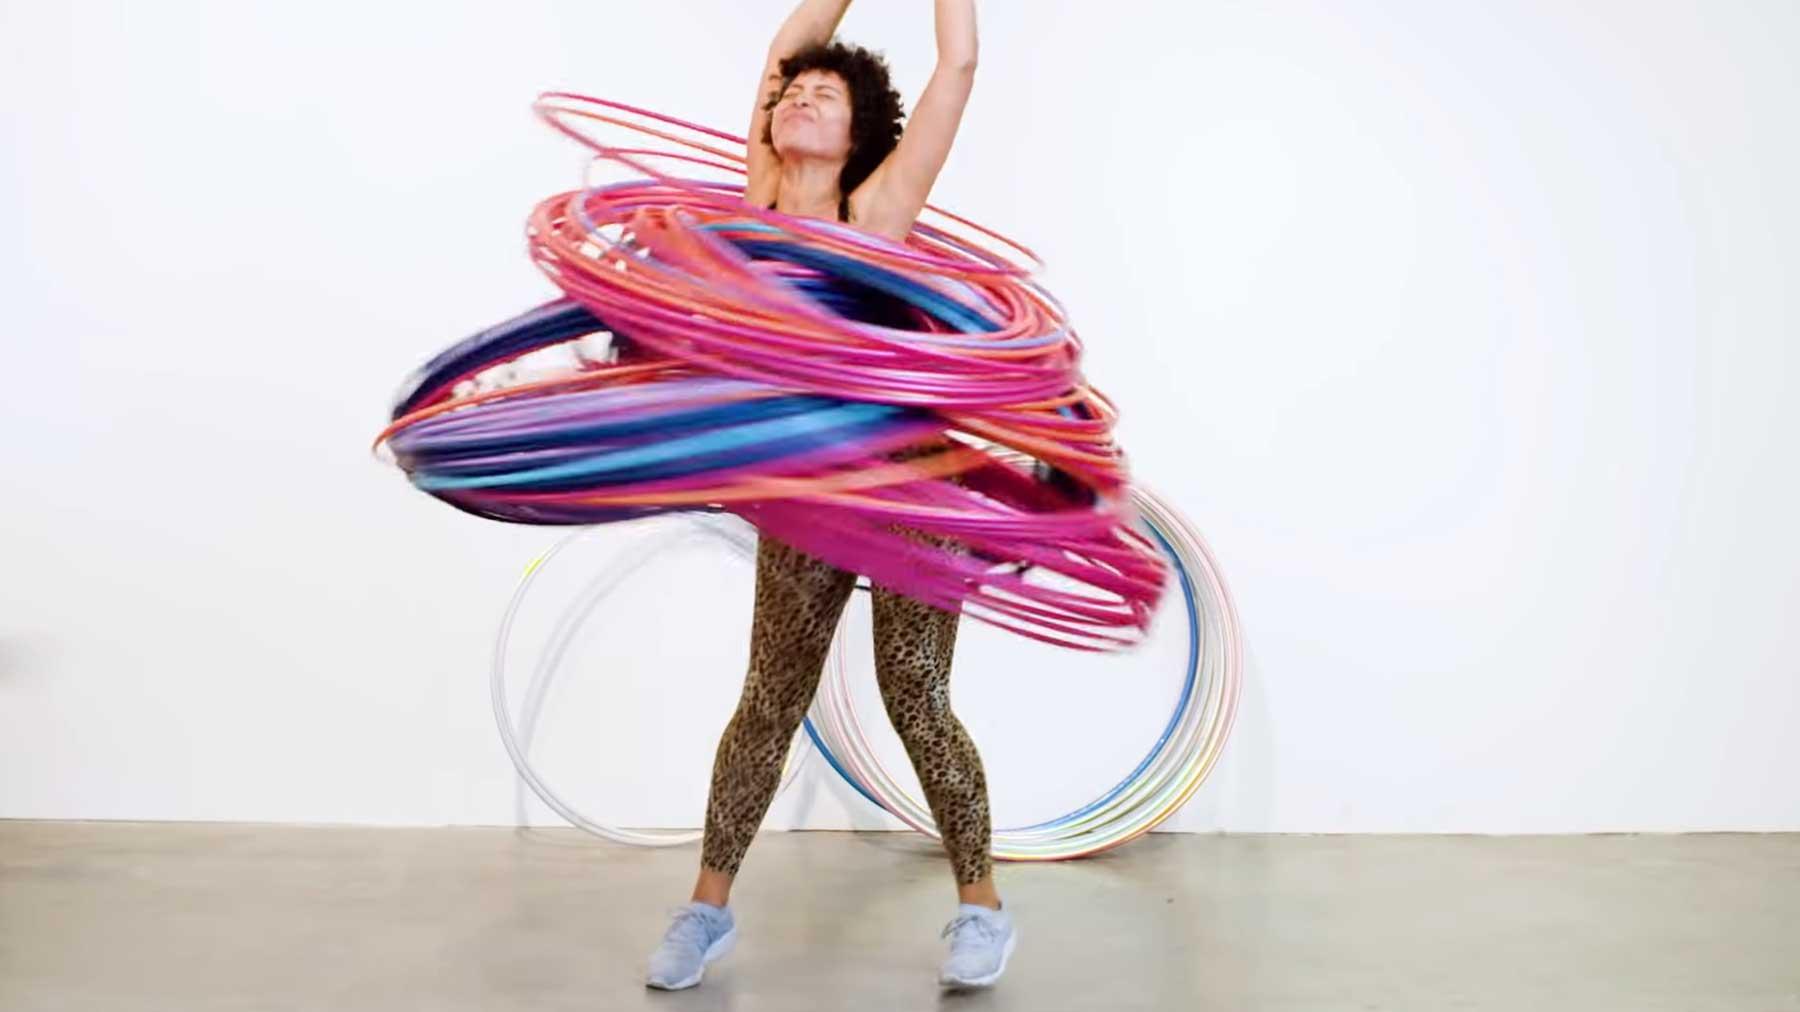 Mit 200 Hula-Hoop-Ringen tanzen